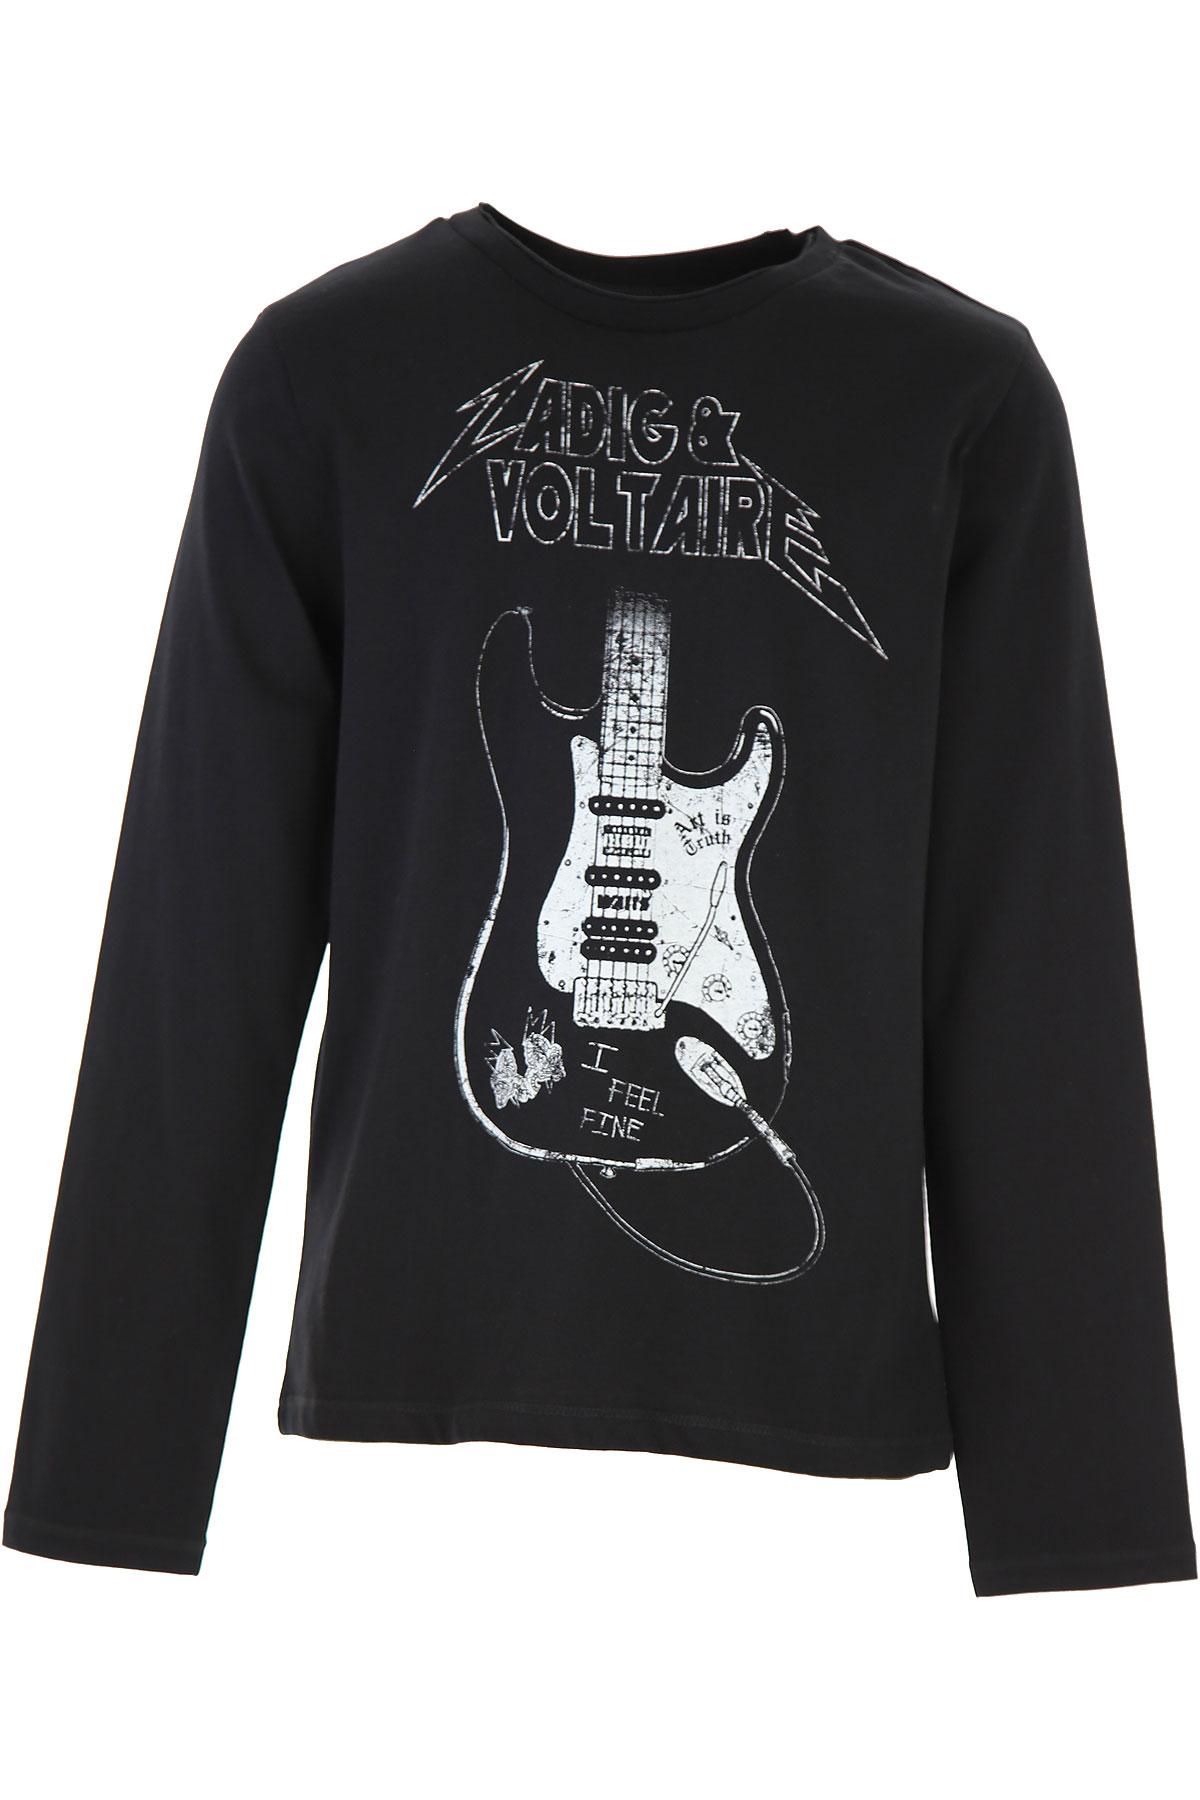 Zadig & Voltaire Kids T-Shirt for Boys On Sale, Black, Cotton, 2019, 10Y 12Y 8Y